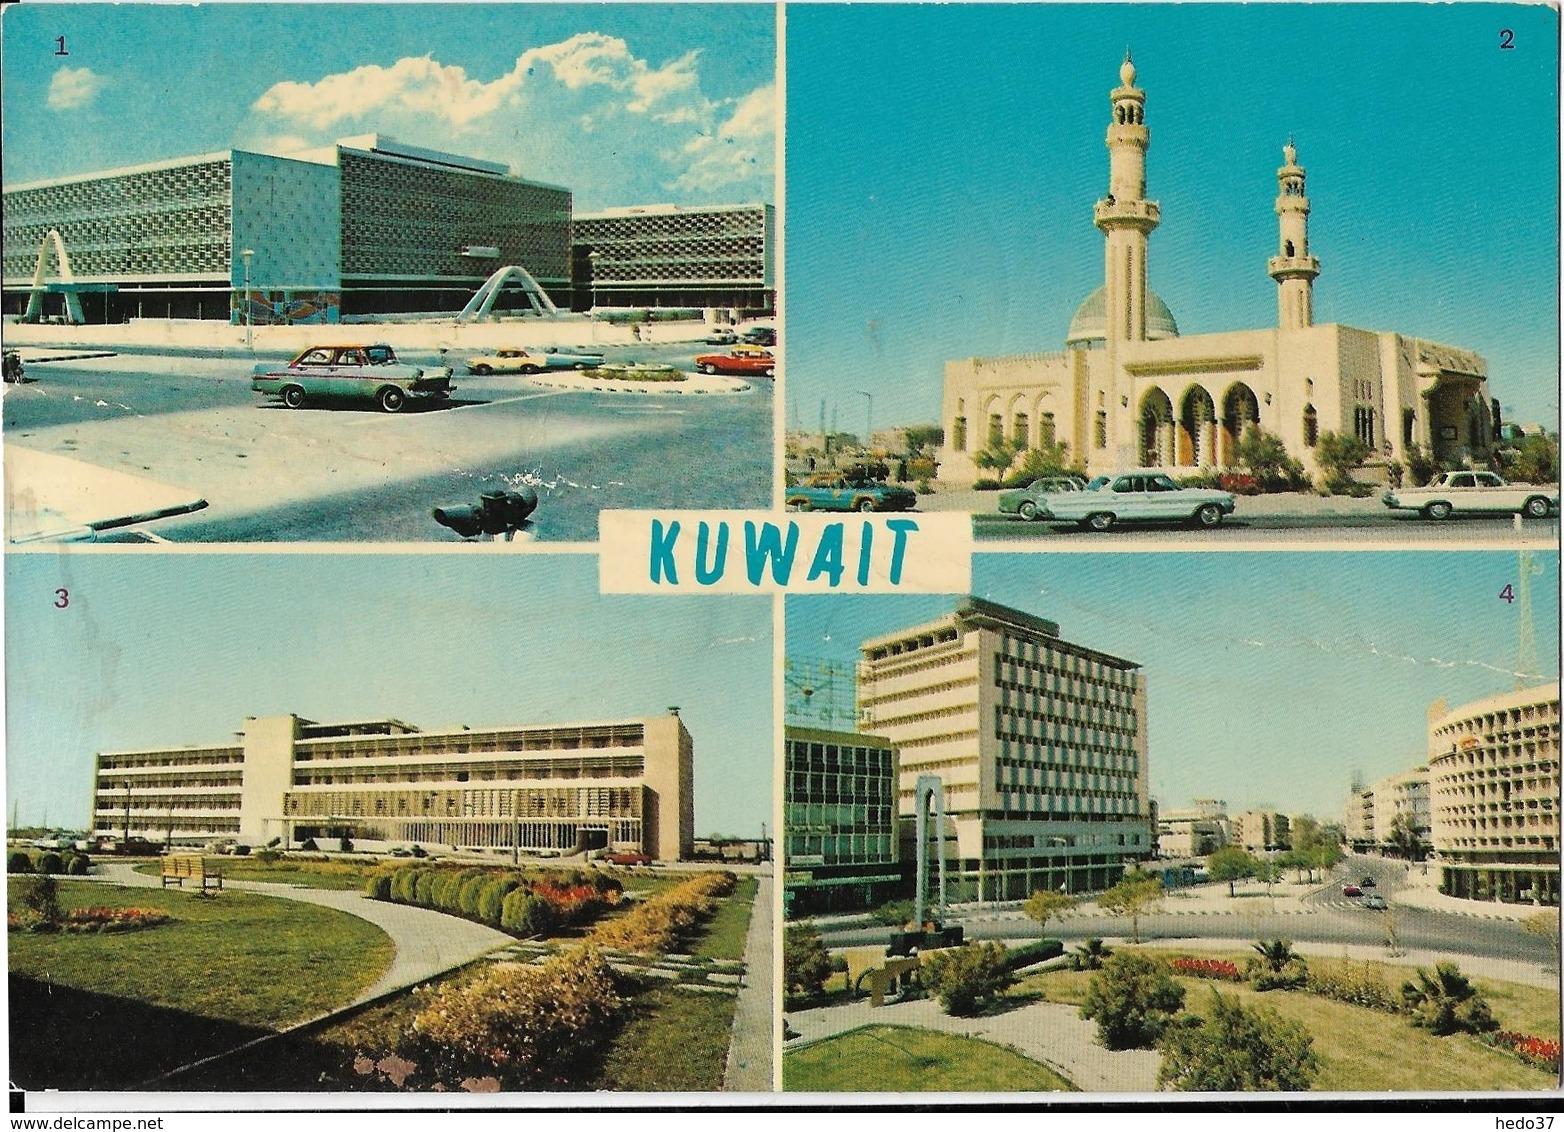 Kuwait - 1.Municipality Buildings - 2.Slamlan Mosque - 3.Sabah Hospital - 4.Fahad Salem Street - Koweït